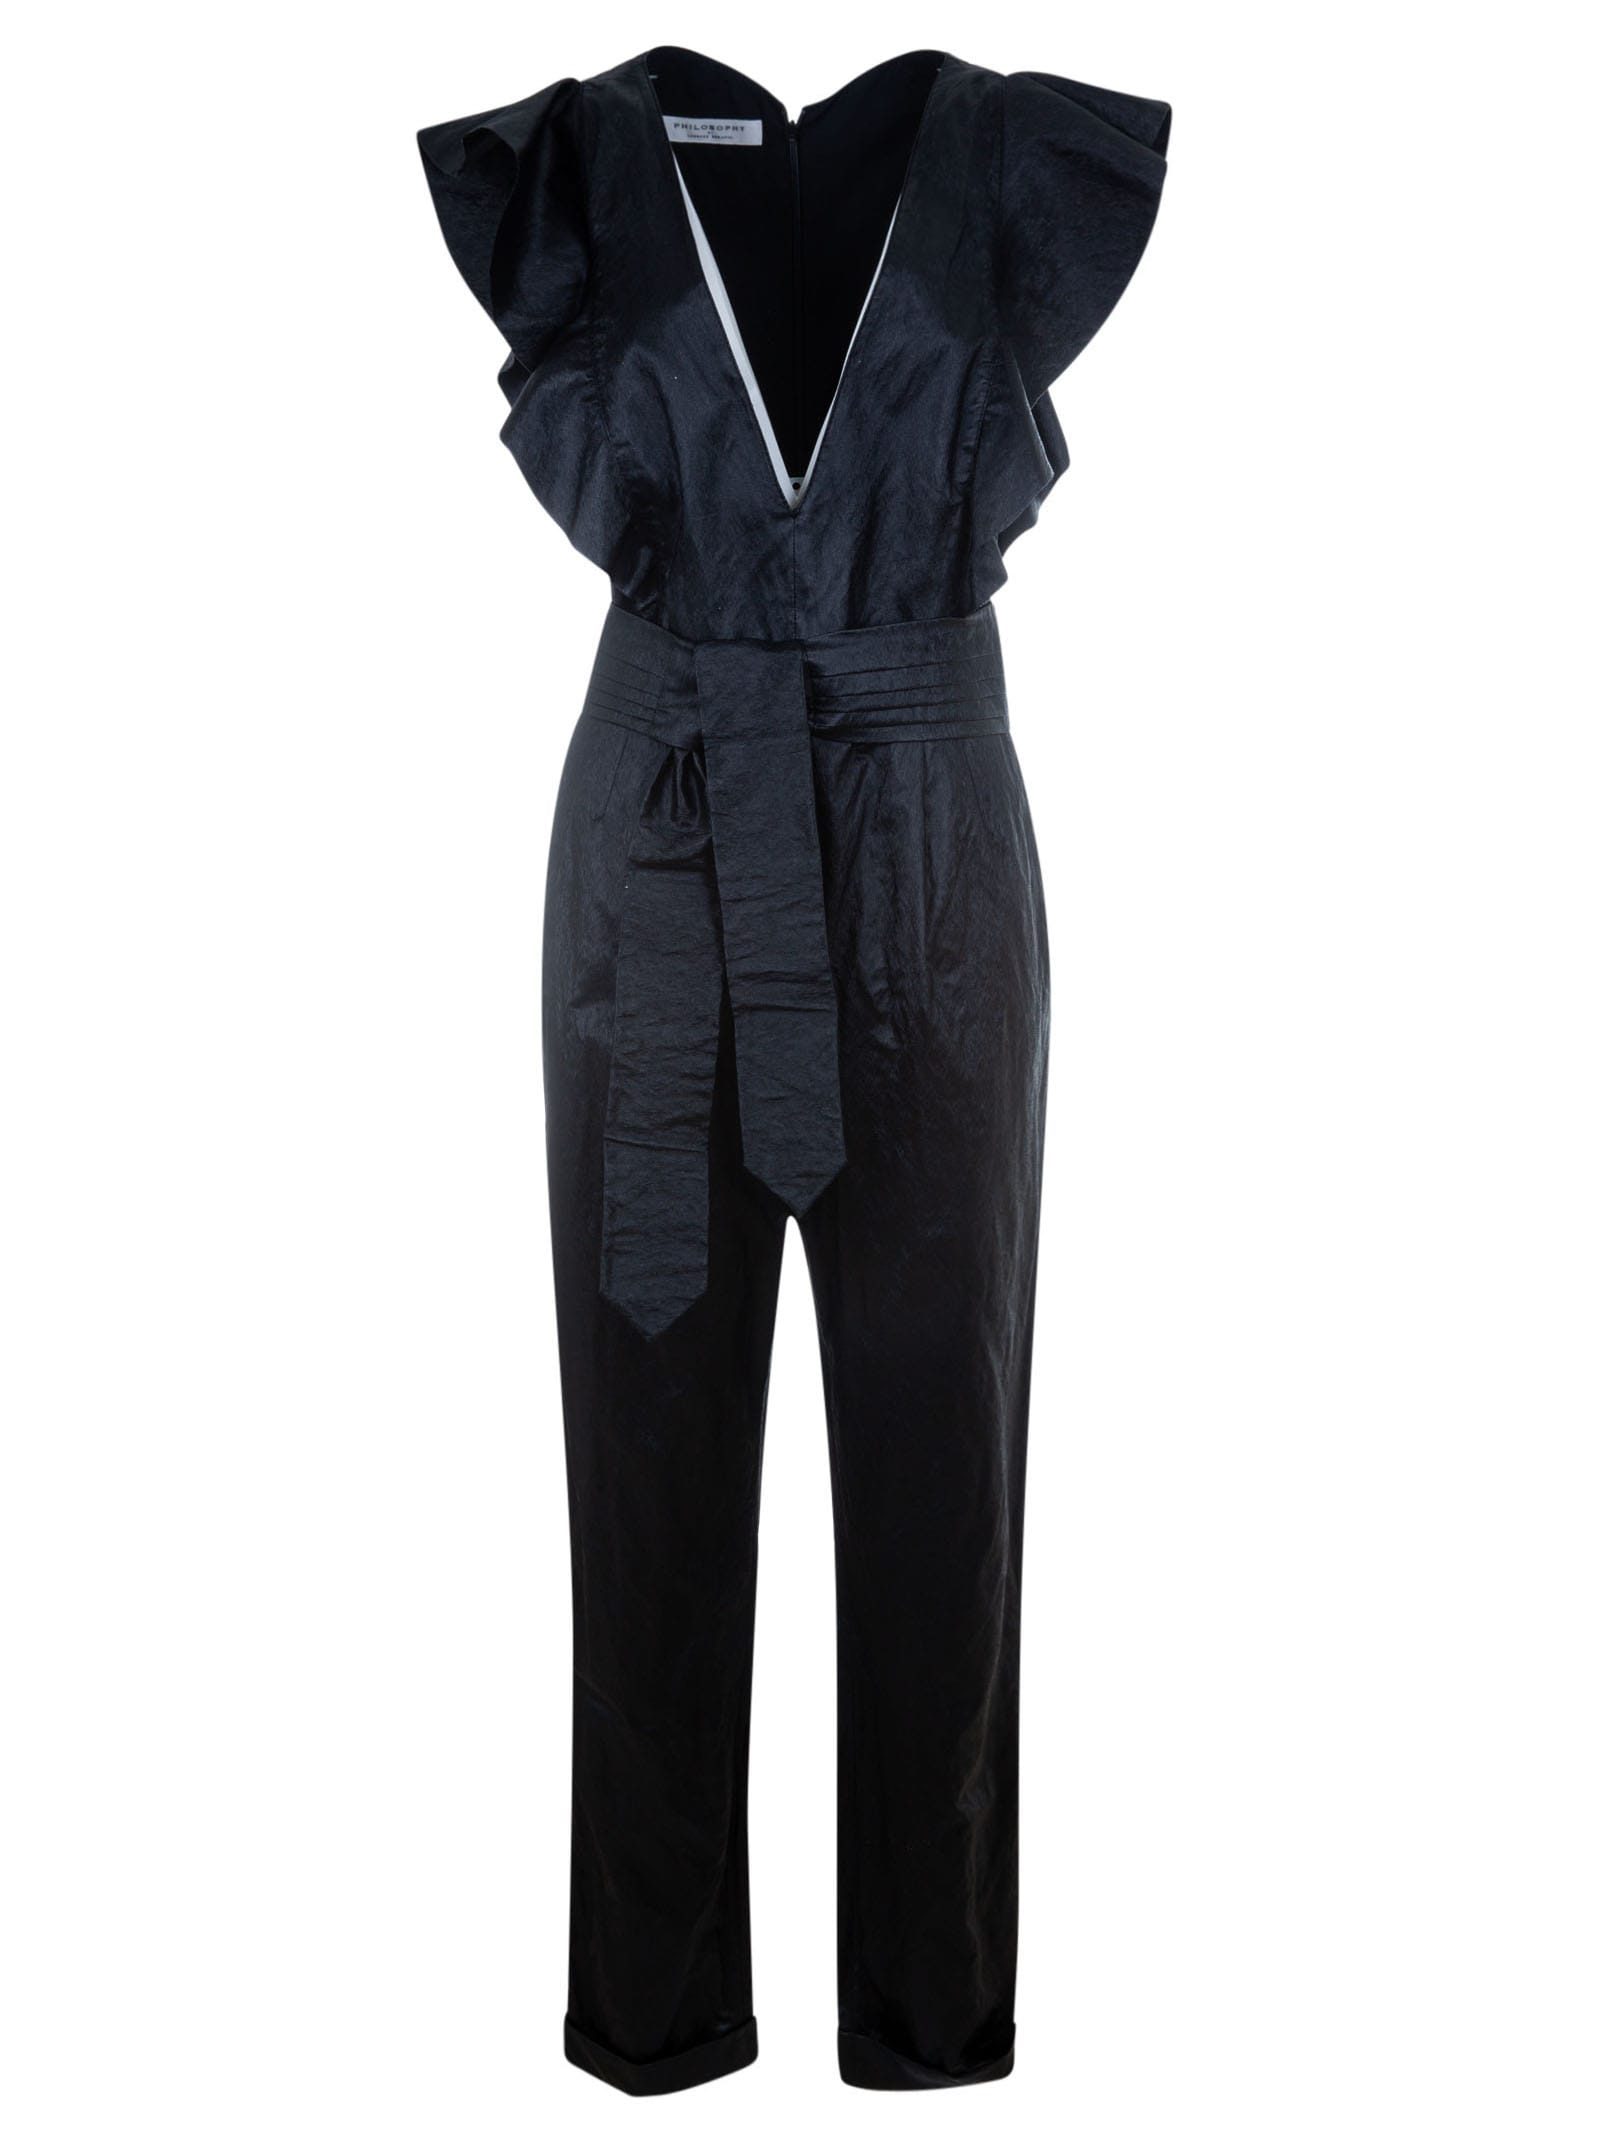 Buy Philosophy di Lorenzo Serafini V-neck Belted Dress online, shop Philosophy di Lorenzo Serafini with free shipping